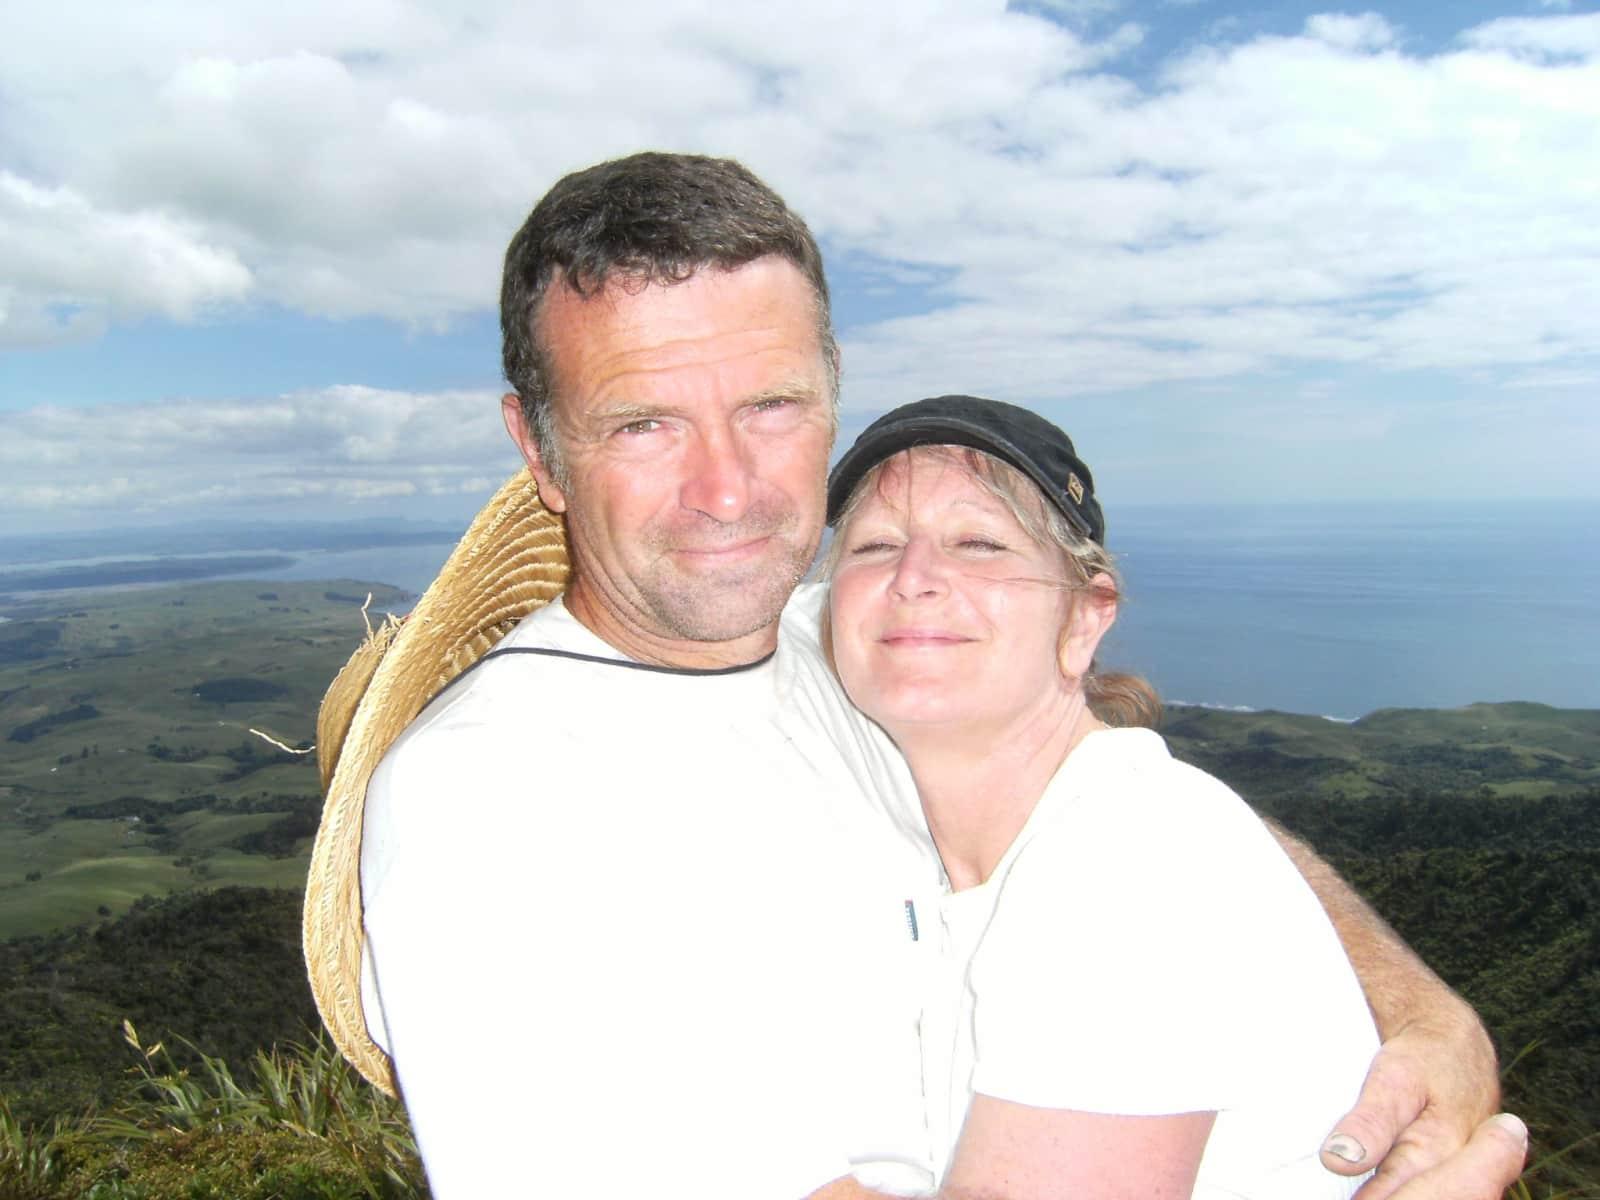 Delwyn & Bruce from Raglan, New Zealand